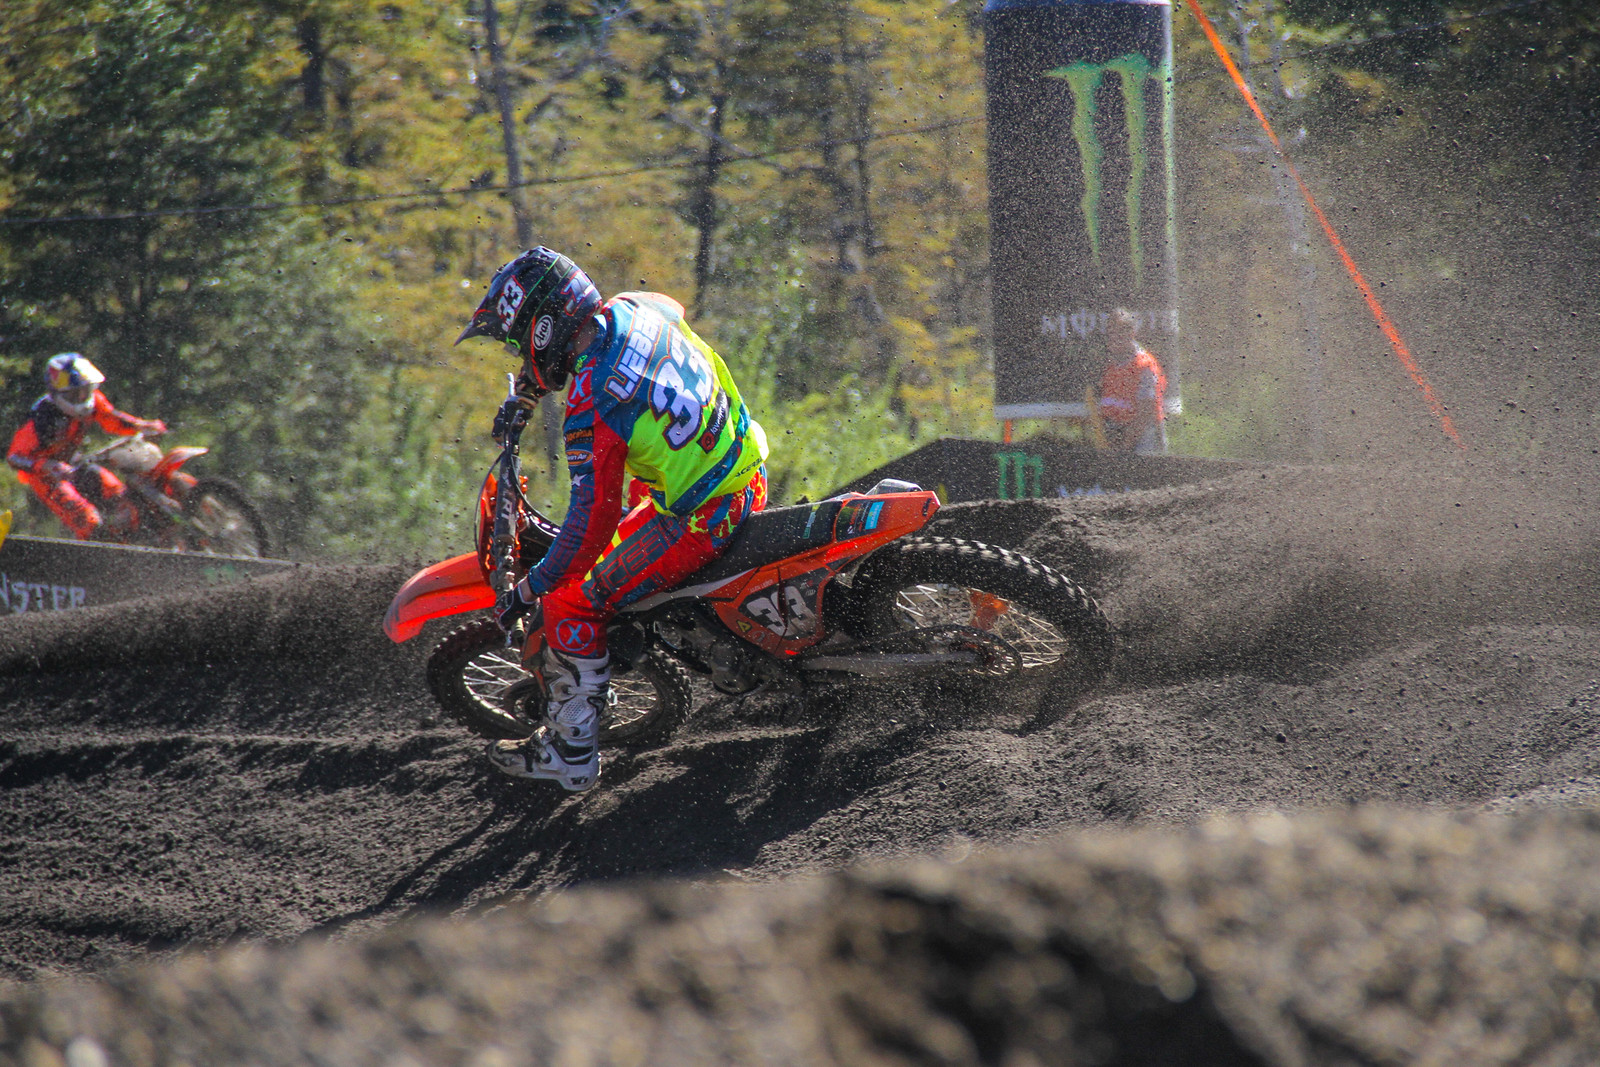 Julien Lieber - Photo Blast: 2017 MXGP of Argentina - Motocross Pictures - Vital MX